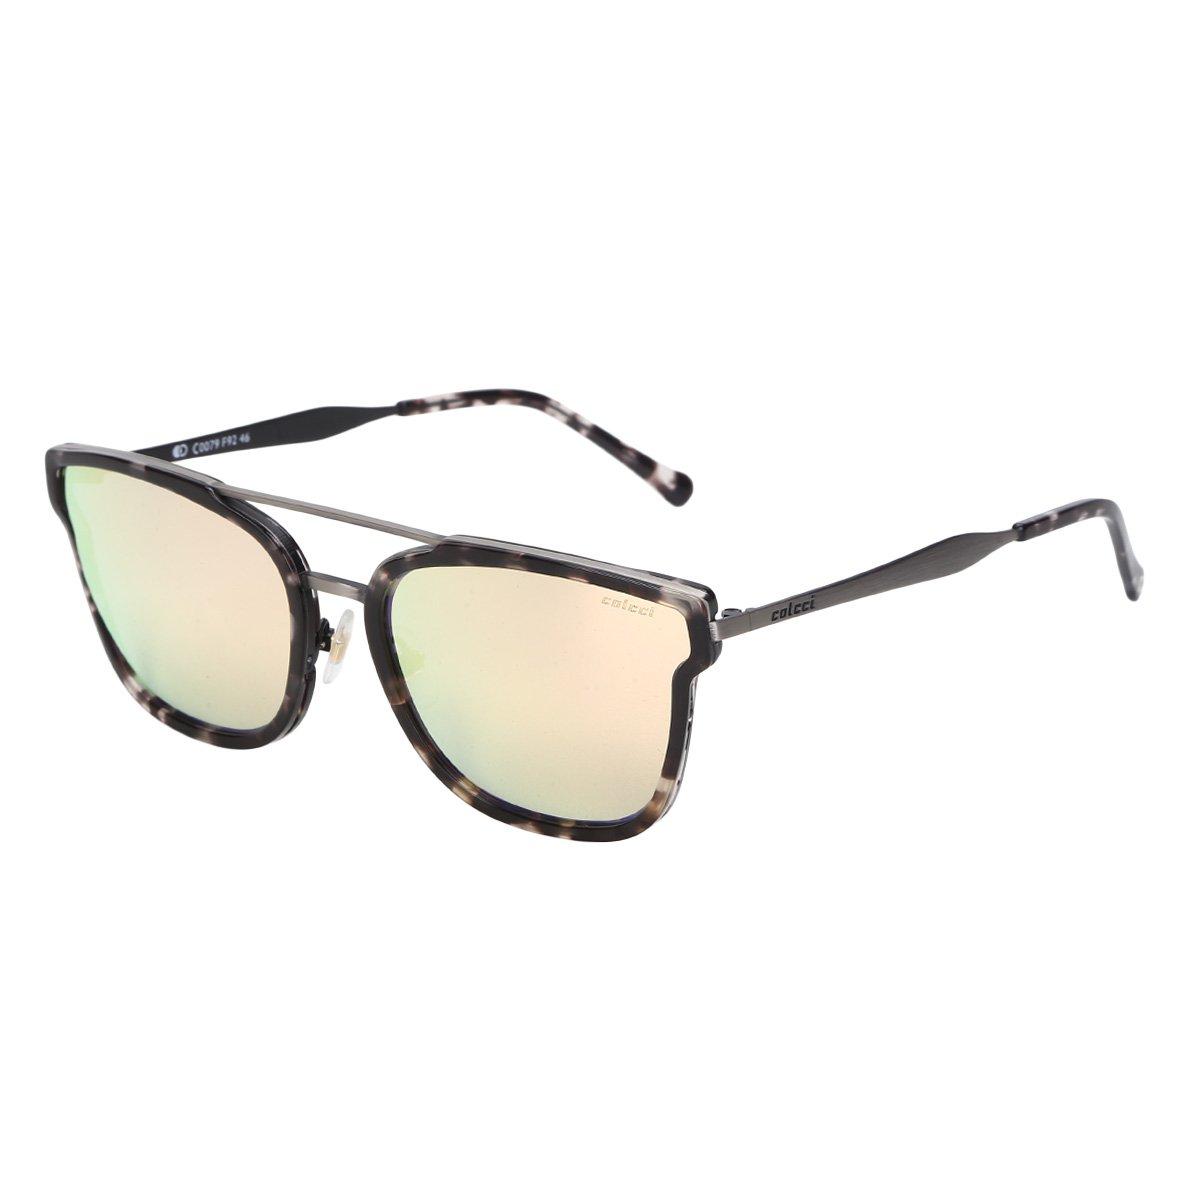 8c6b1f9b5 Óculos de Sol Colcci C0079 Feminino - Prata   Netshoes